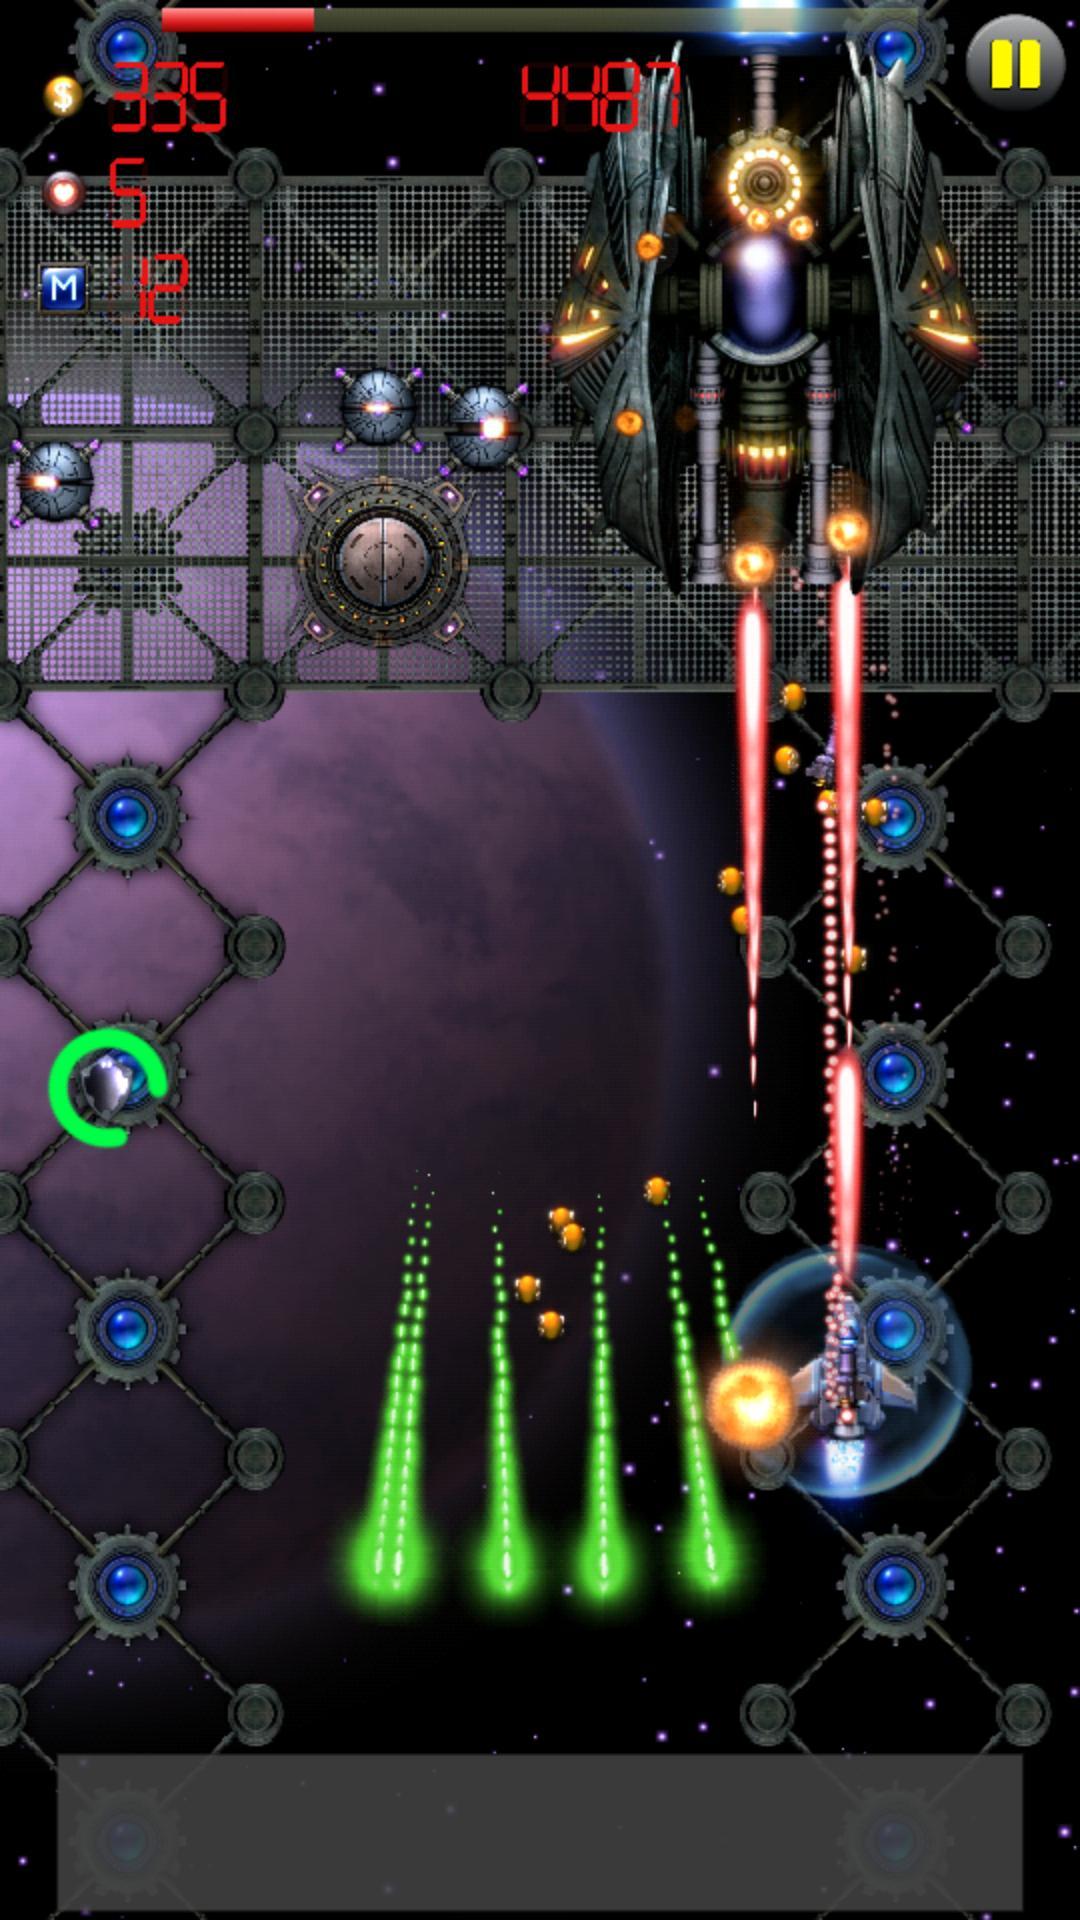 Galaxy Patrol Space Shooter 1.0 Screenshot 5